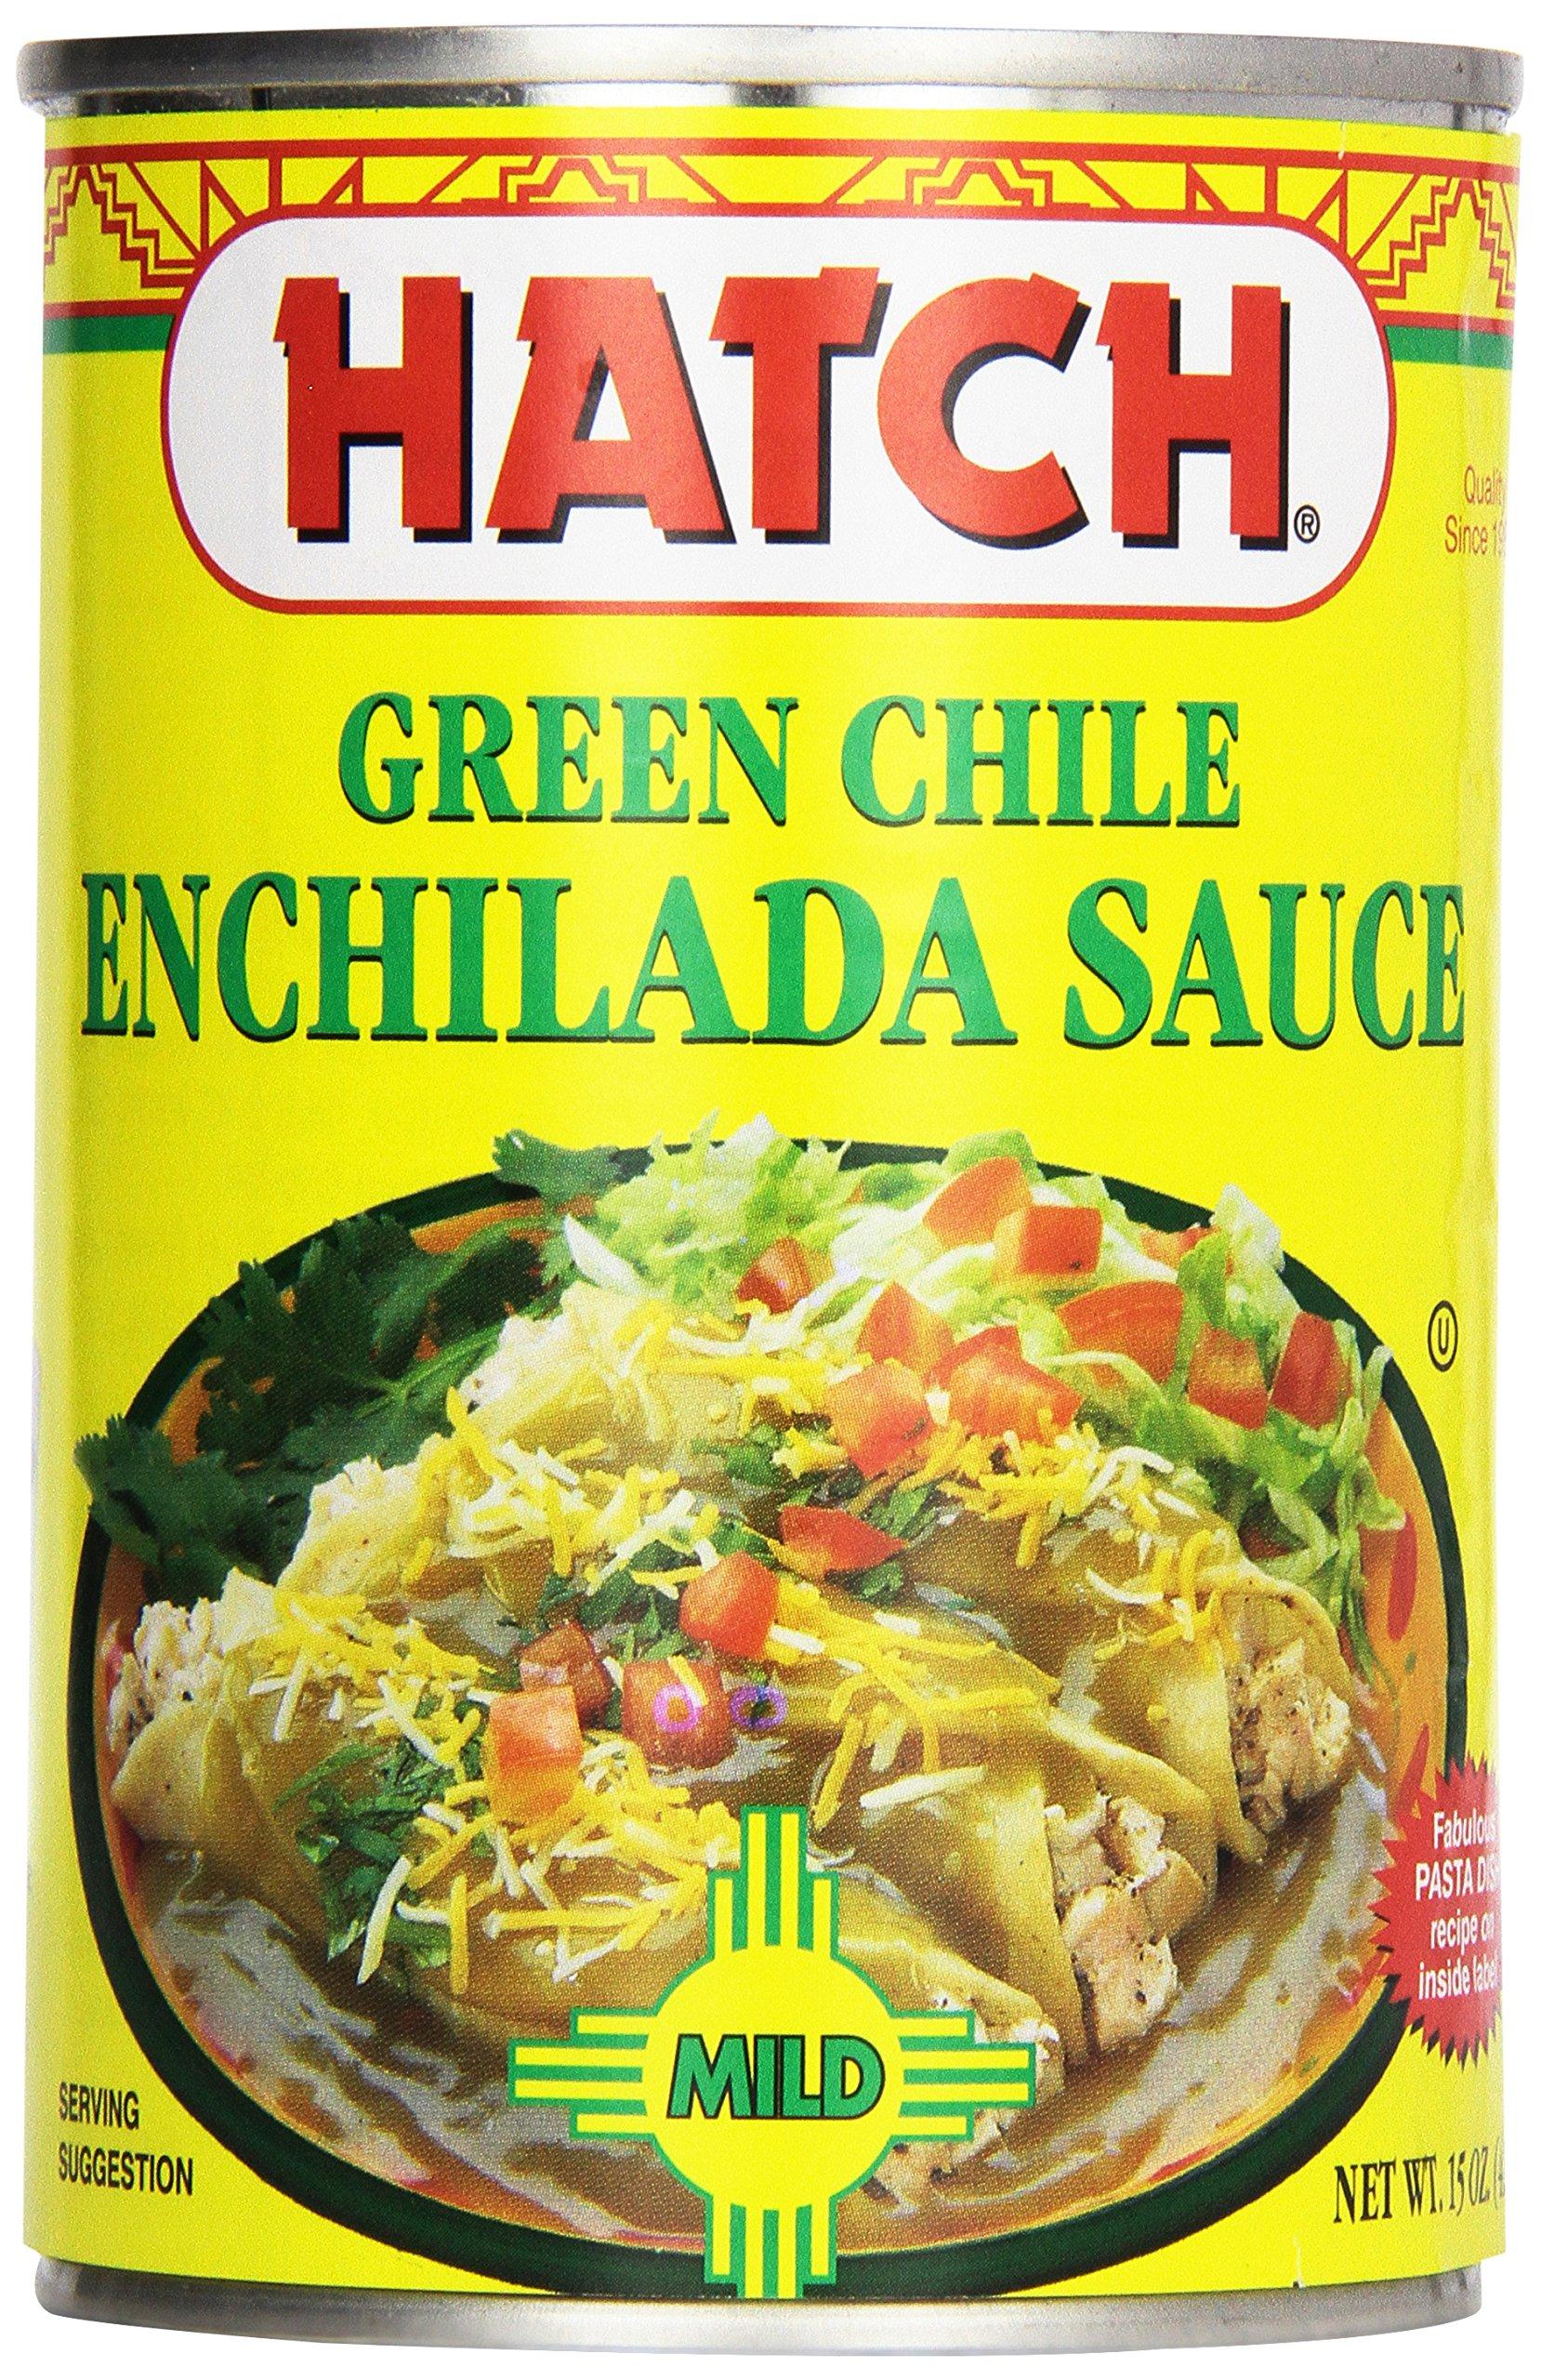 Hatch Farms Mild Green Chile Enchilada Sauce 15oz.(pack of 12)